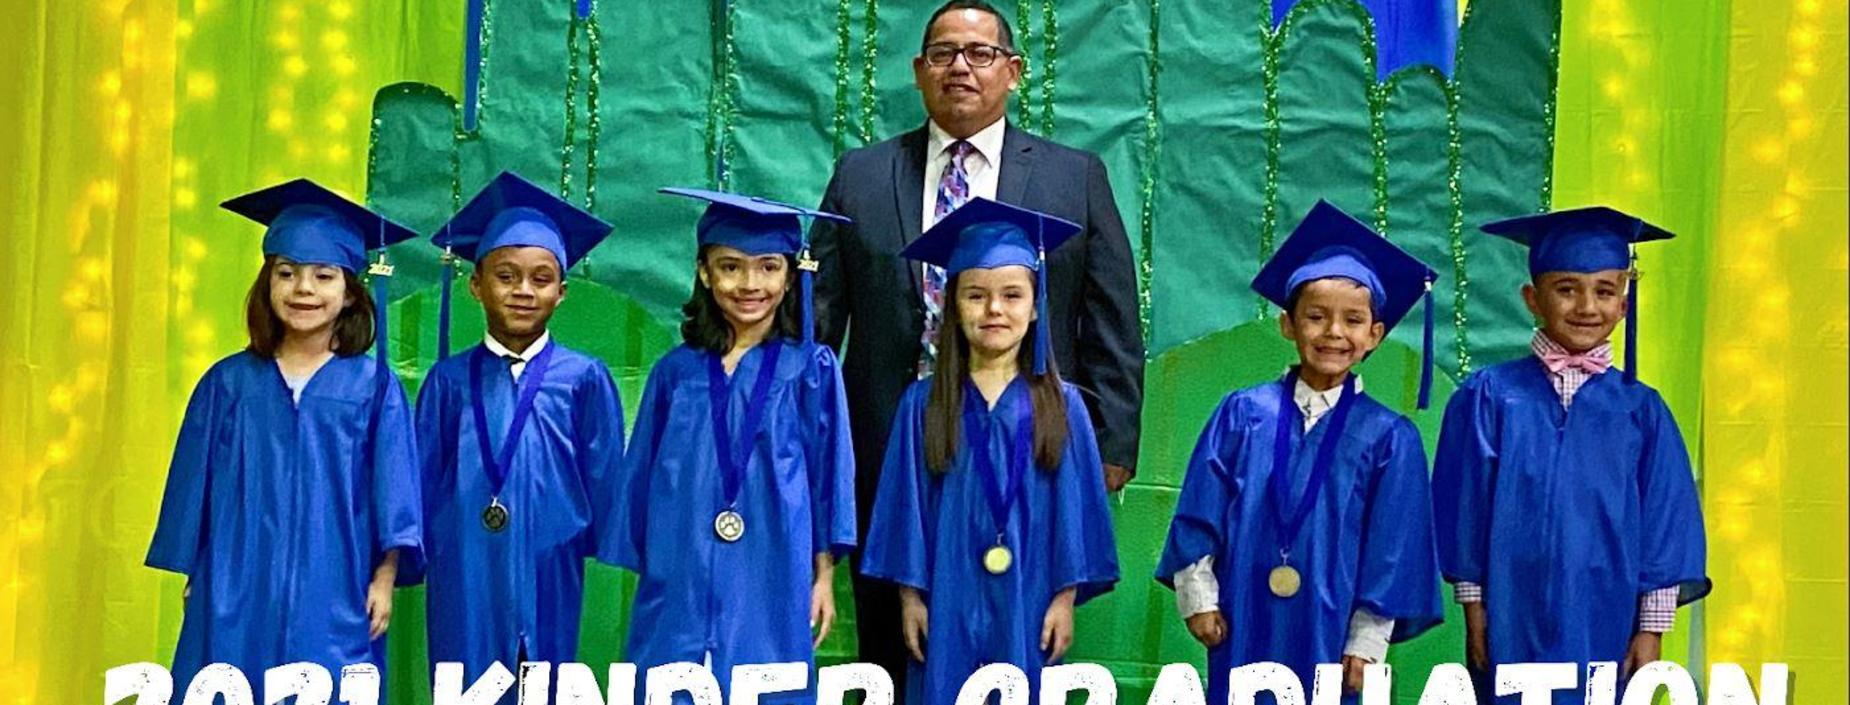 2021 Kinder Graduation